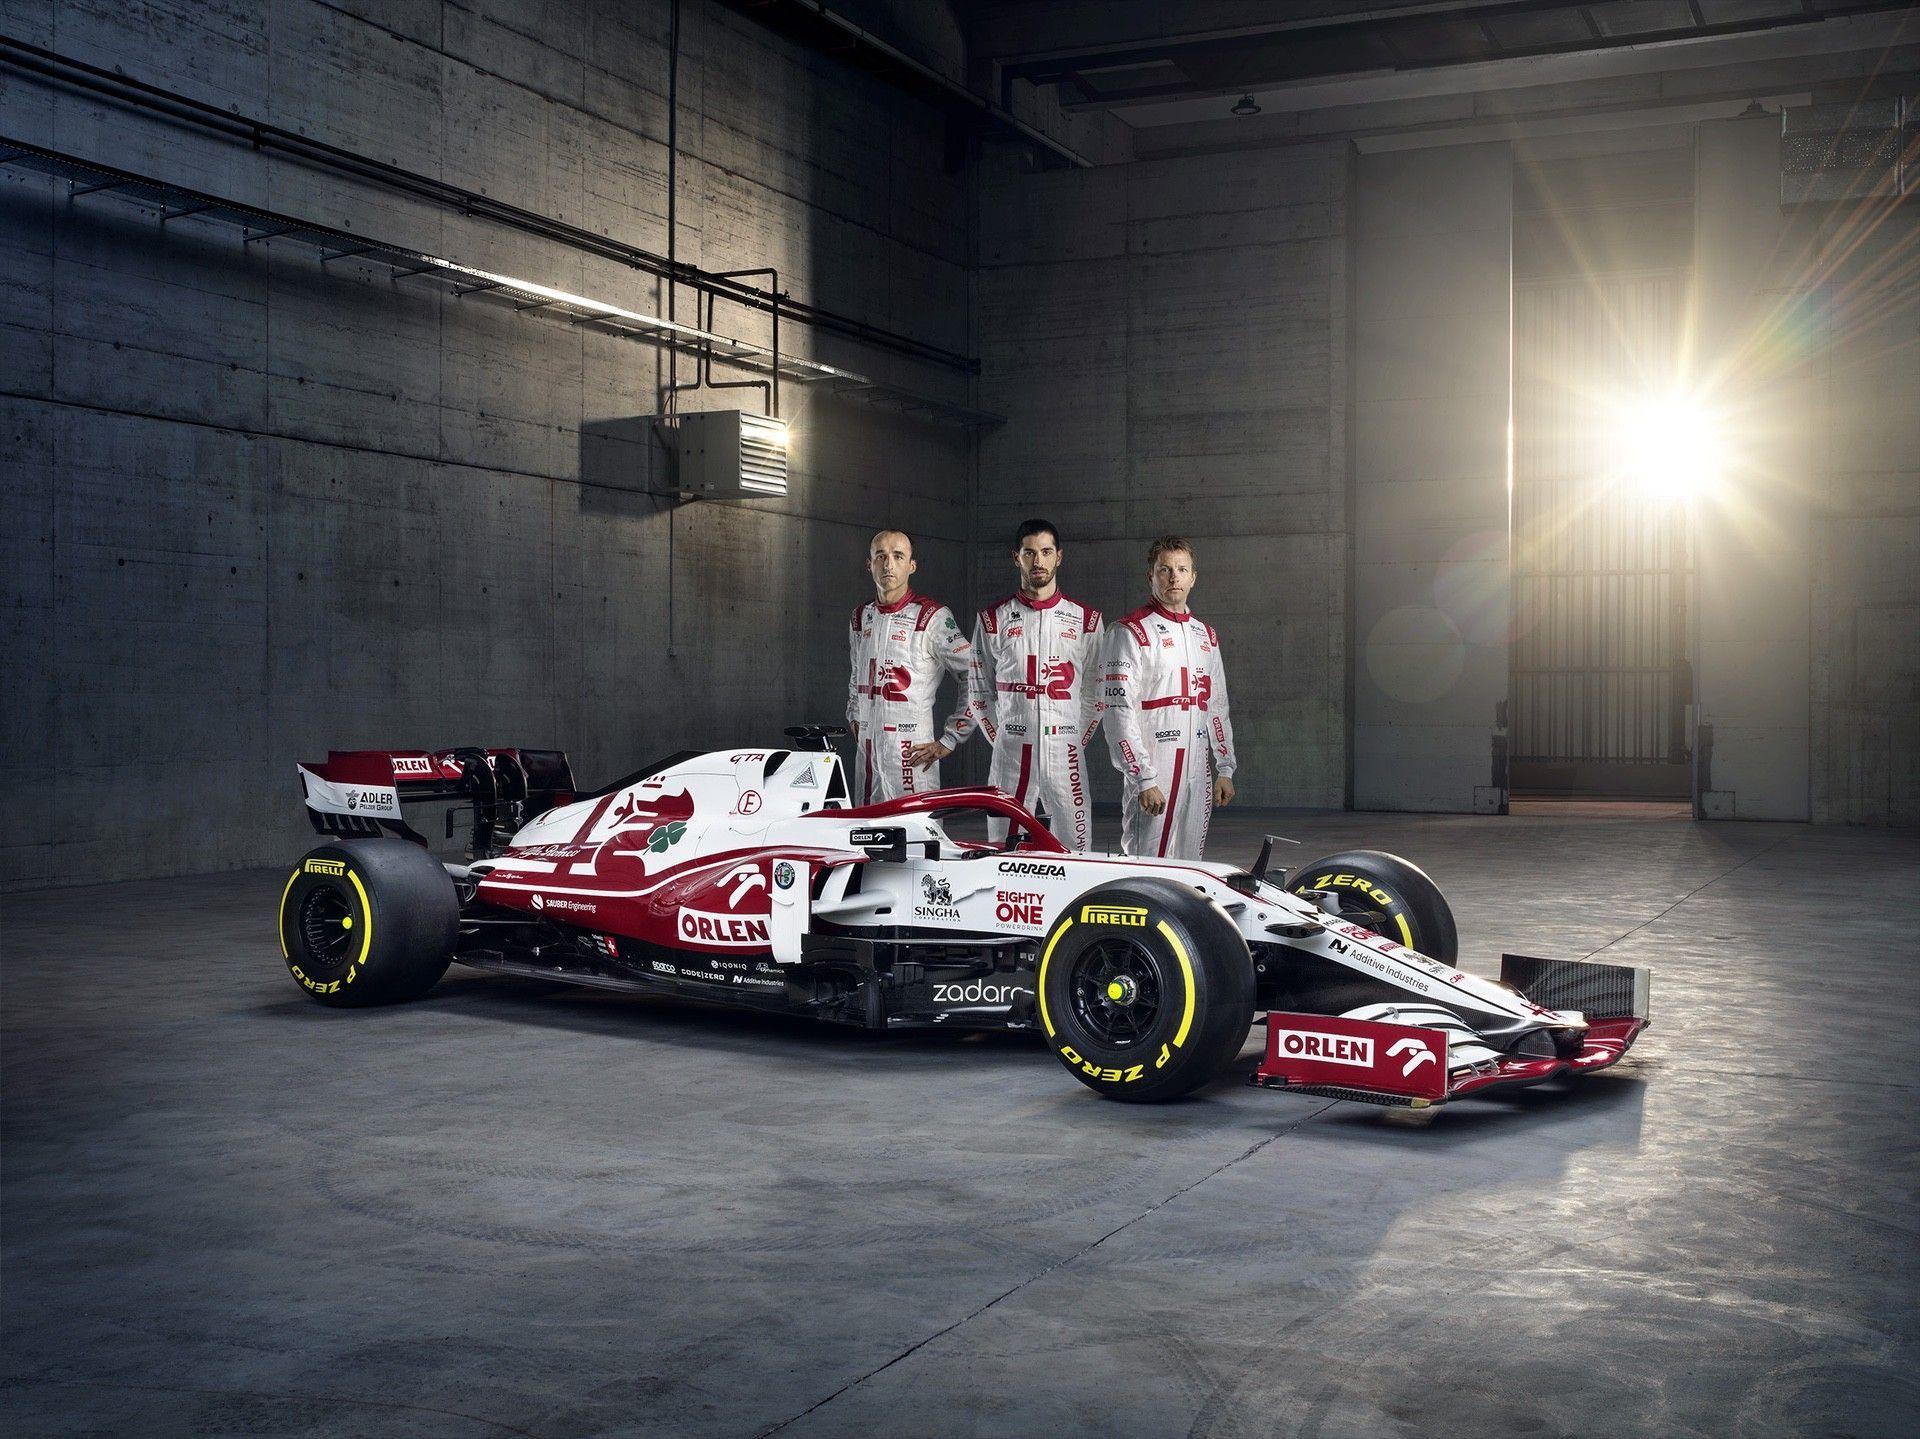 Alfa-Romeo-Racing-ORLEN-with-Drivers-2